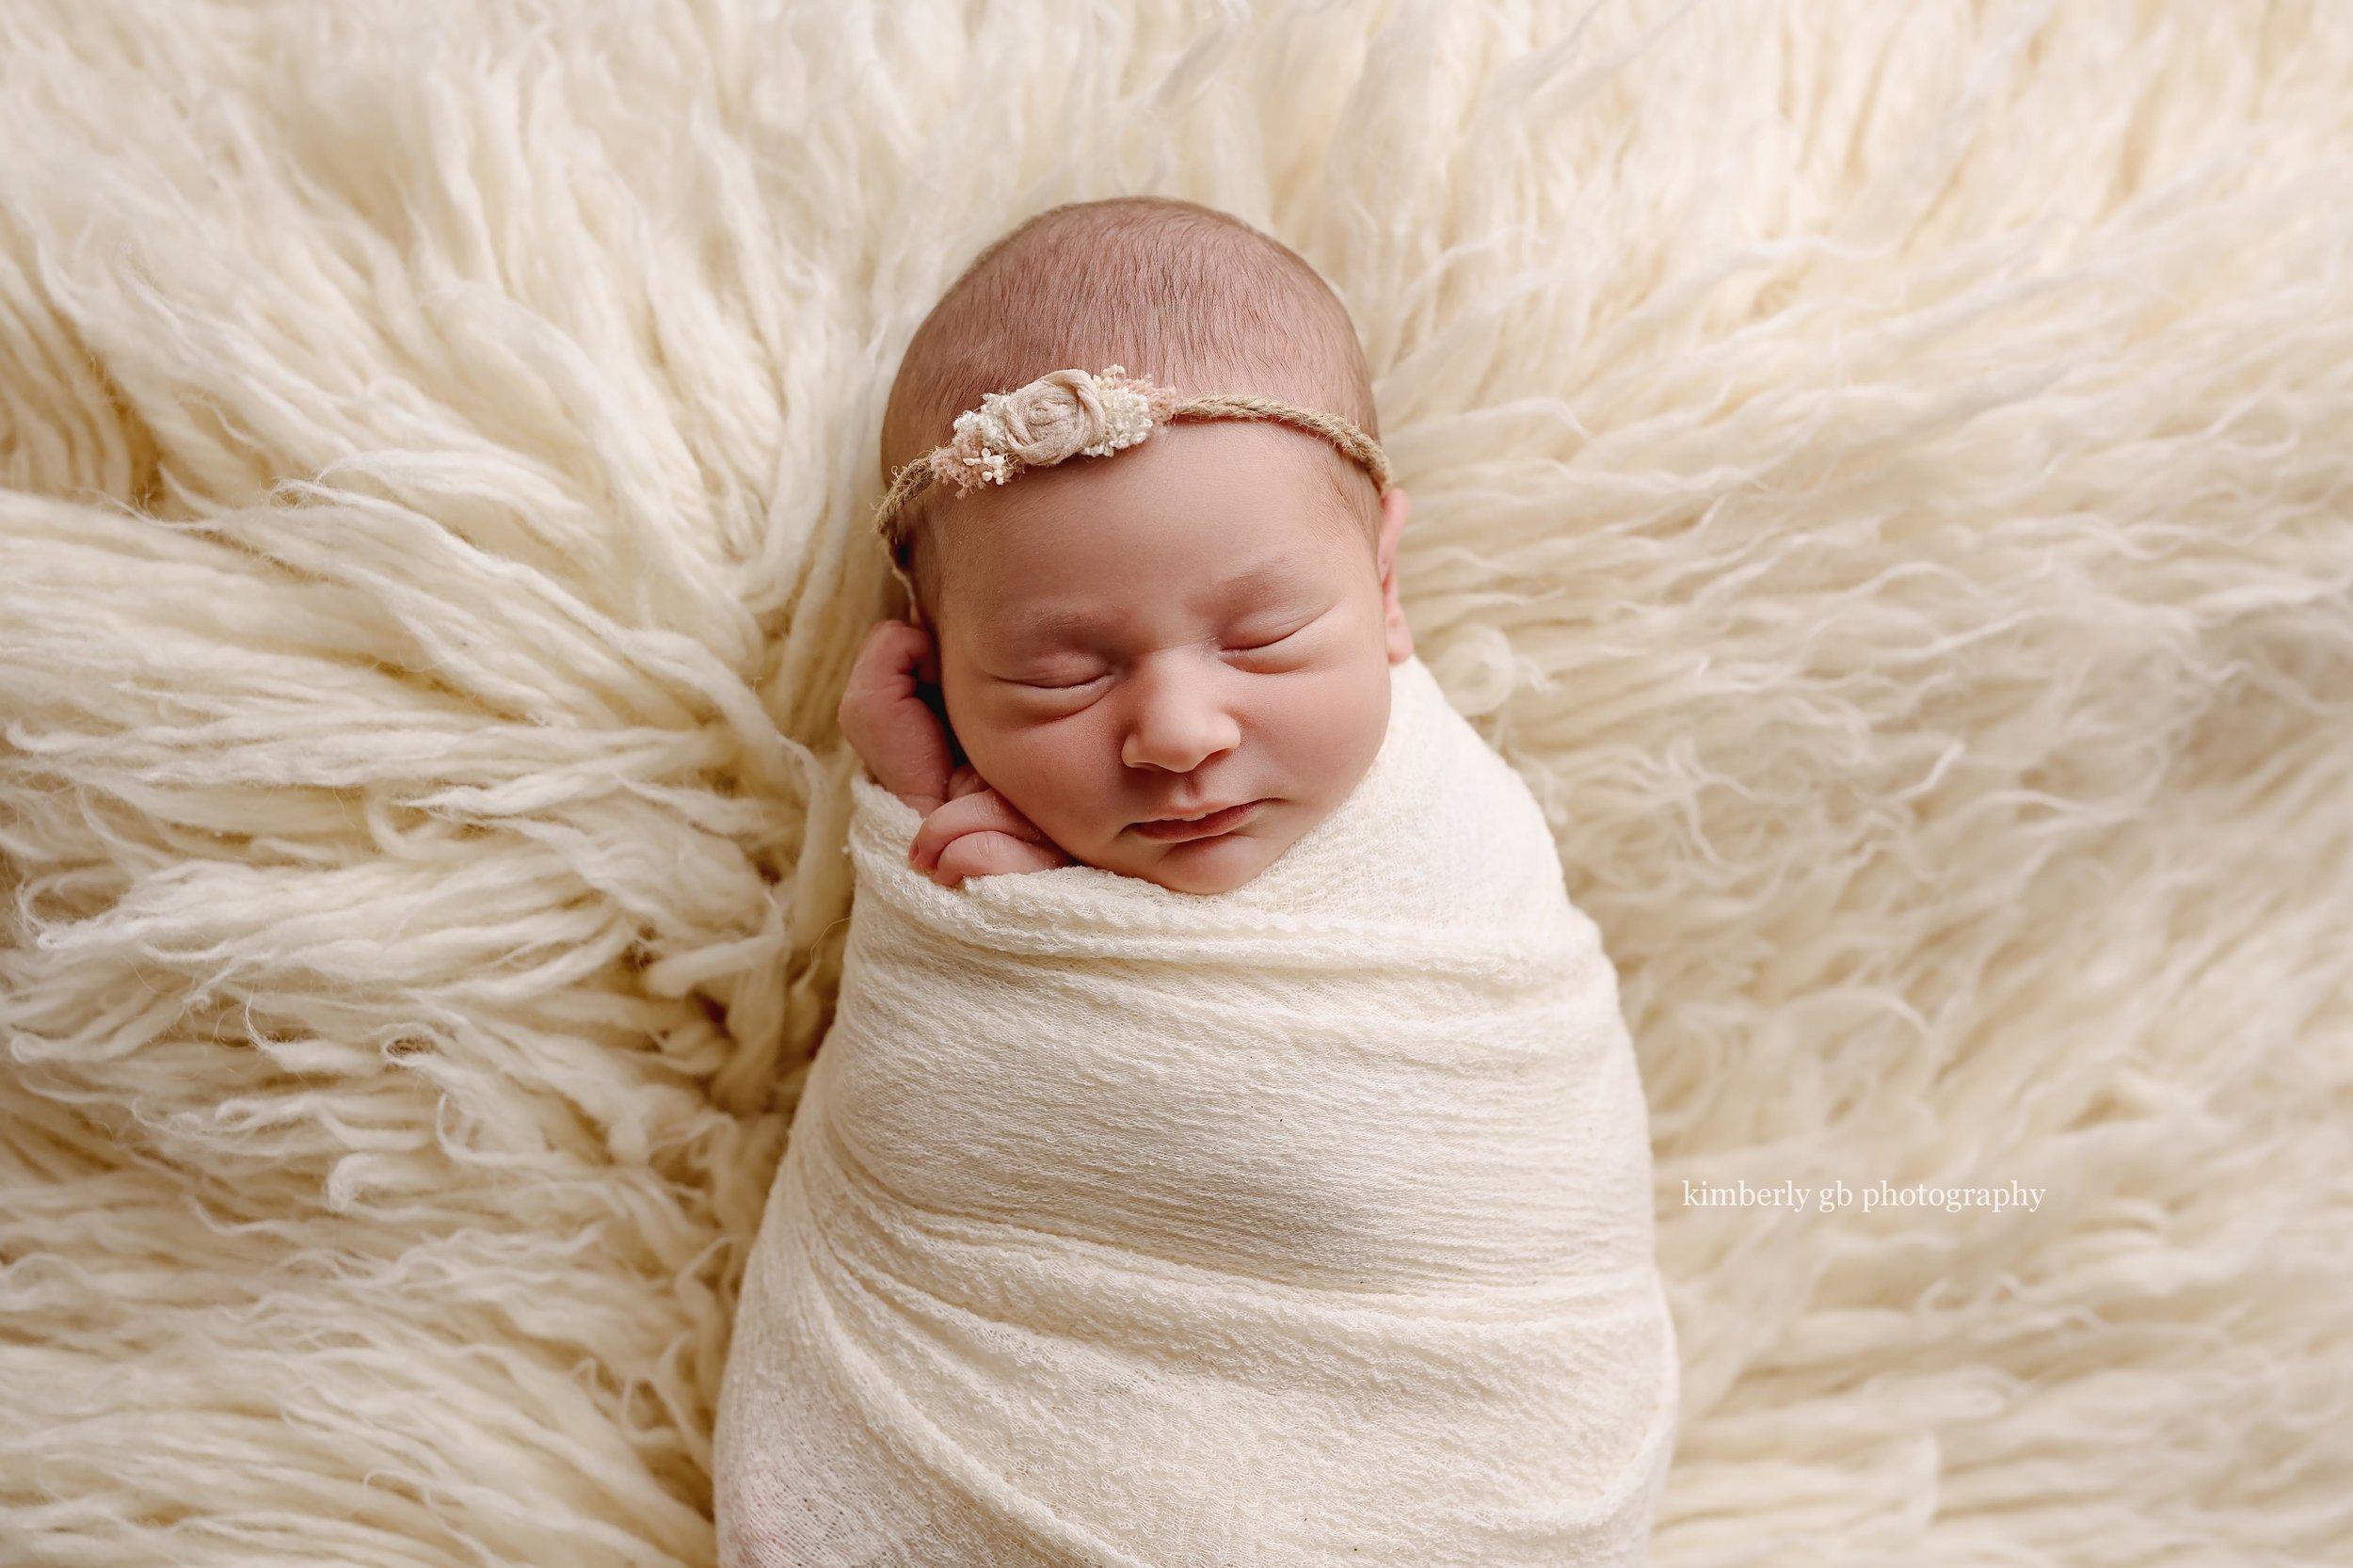 fotografia-de-recien-nacidos-bebes-newborn-en-puerto-rico-kimberly-gb-photography-fotografa-297.jpg